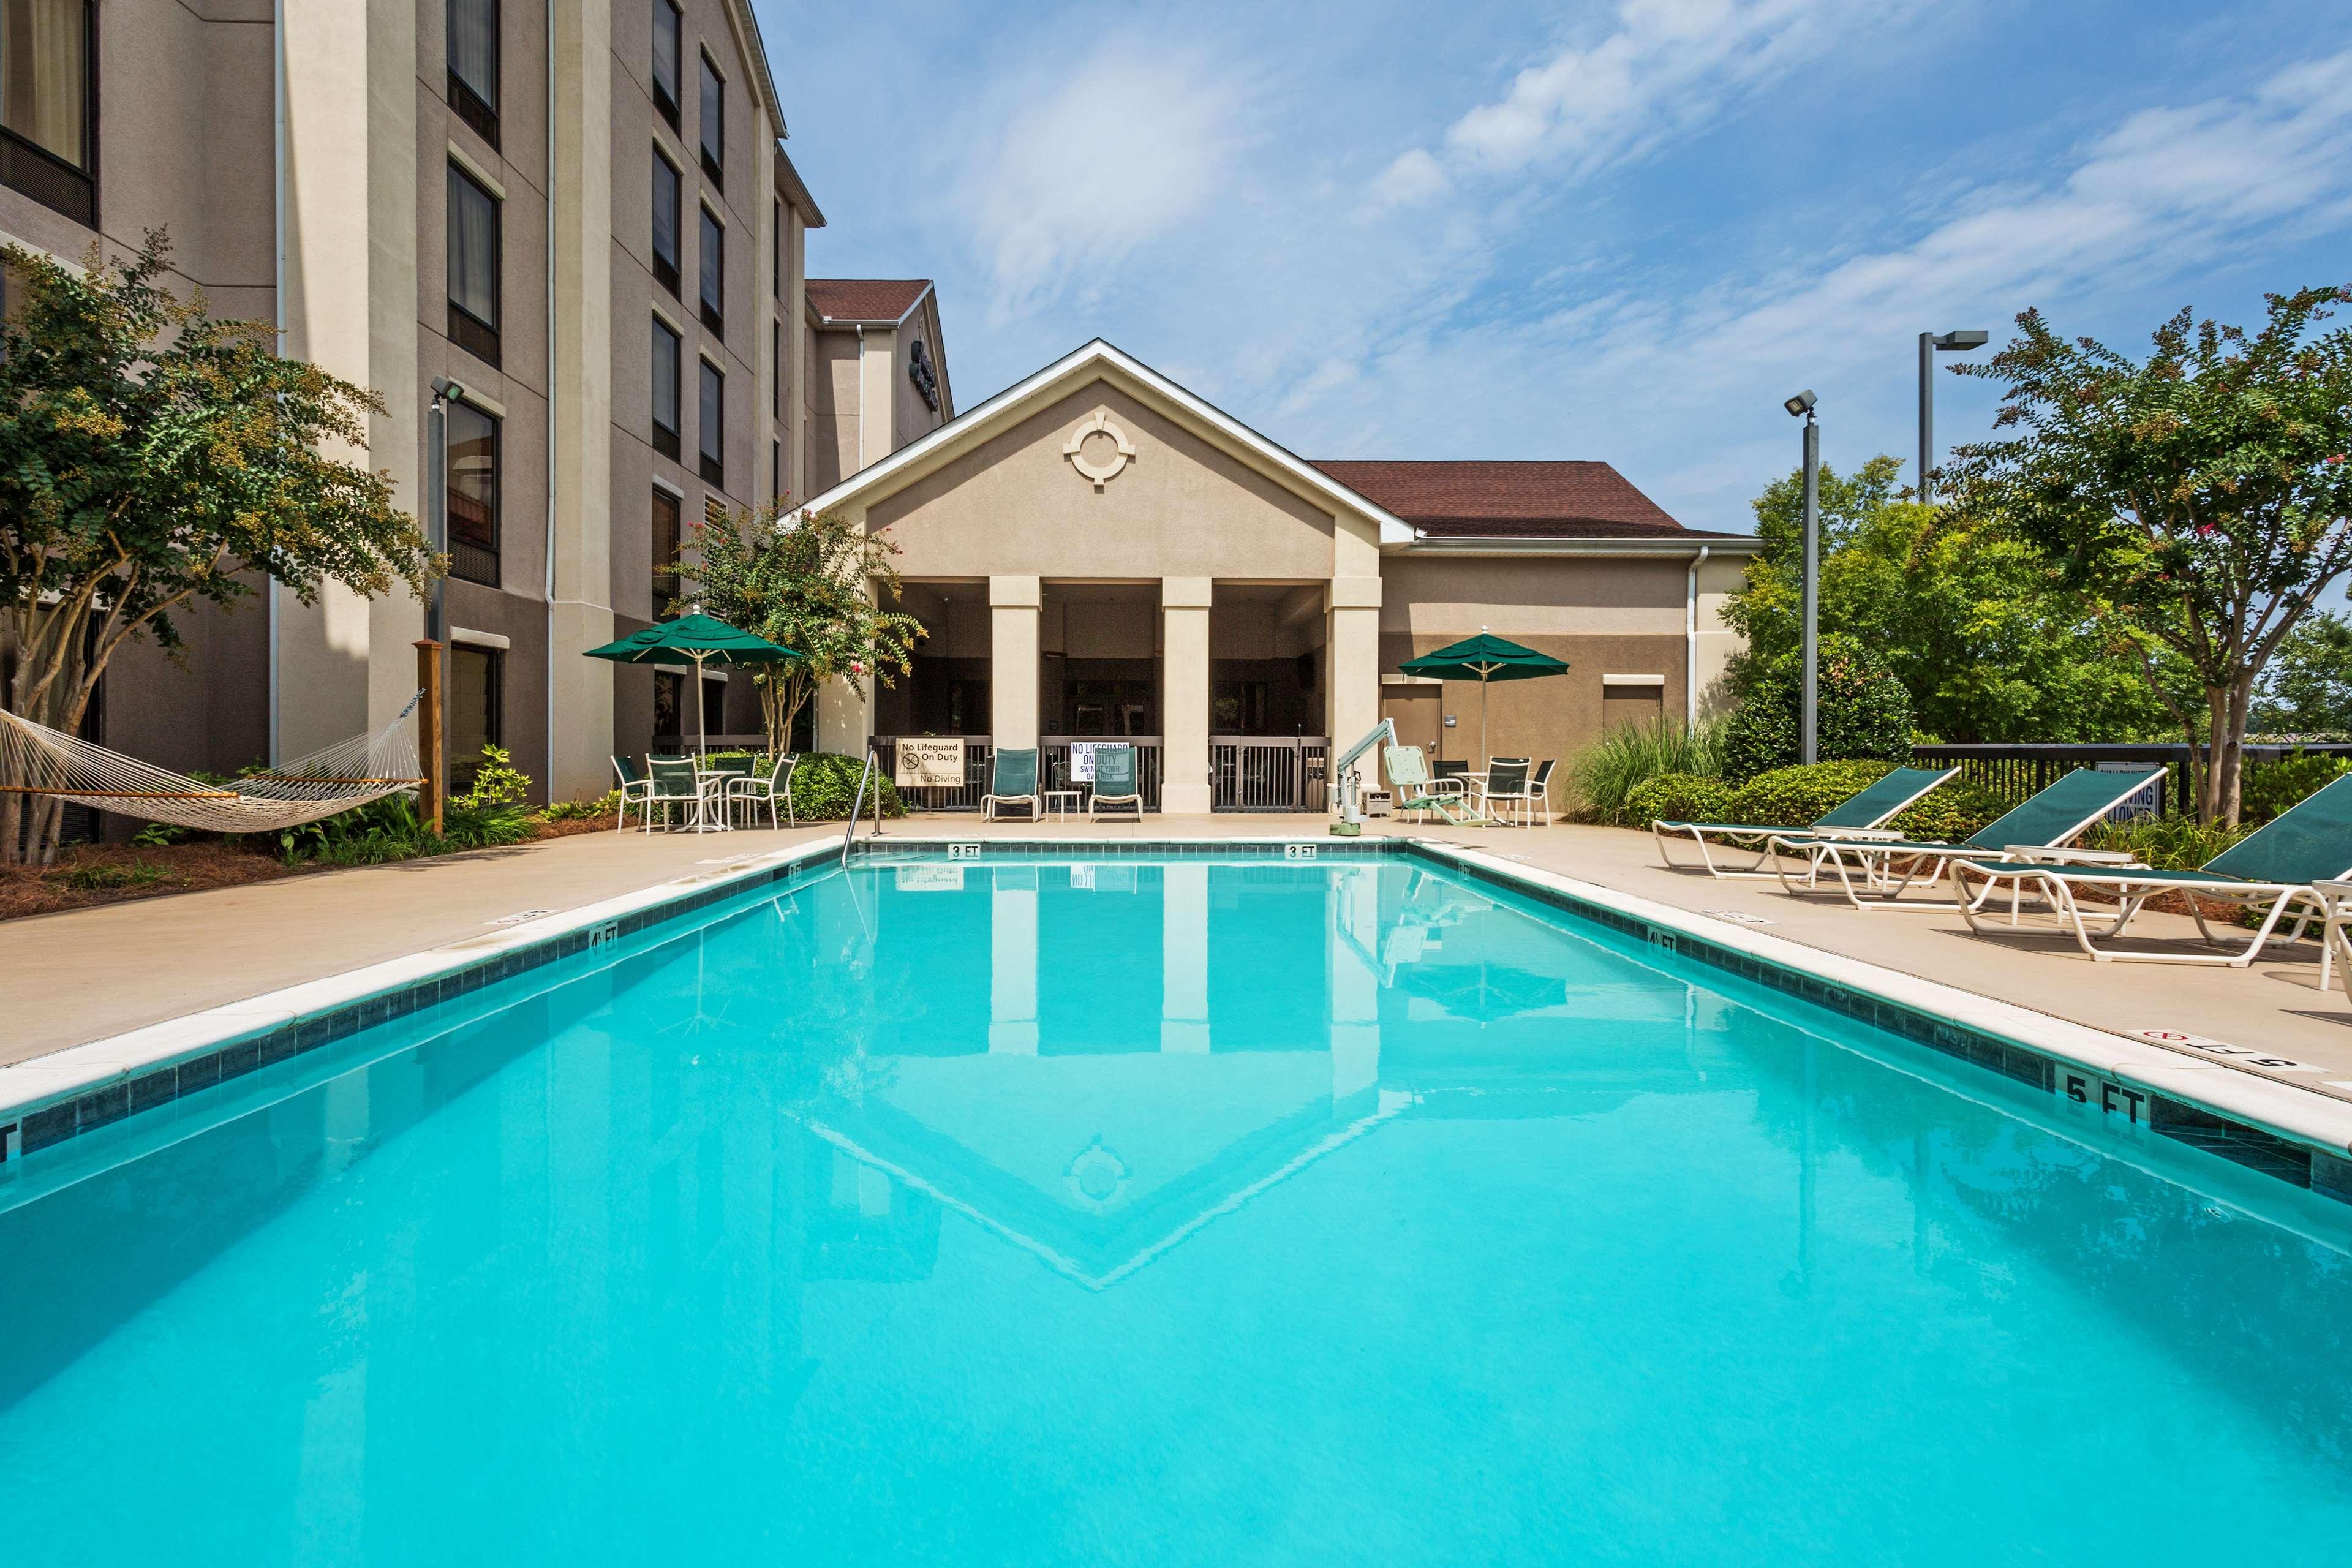 Hampton Inn & Suites Greenville/Spartanburg I-85 image 11